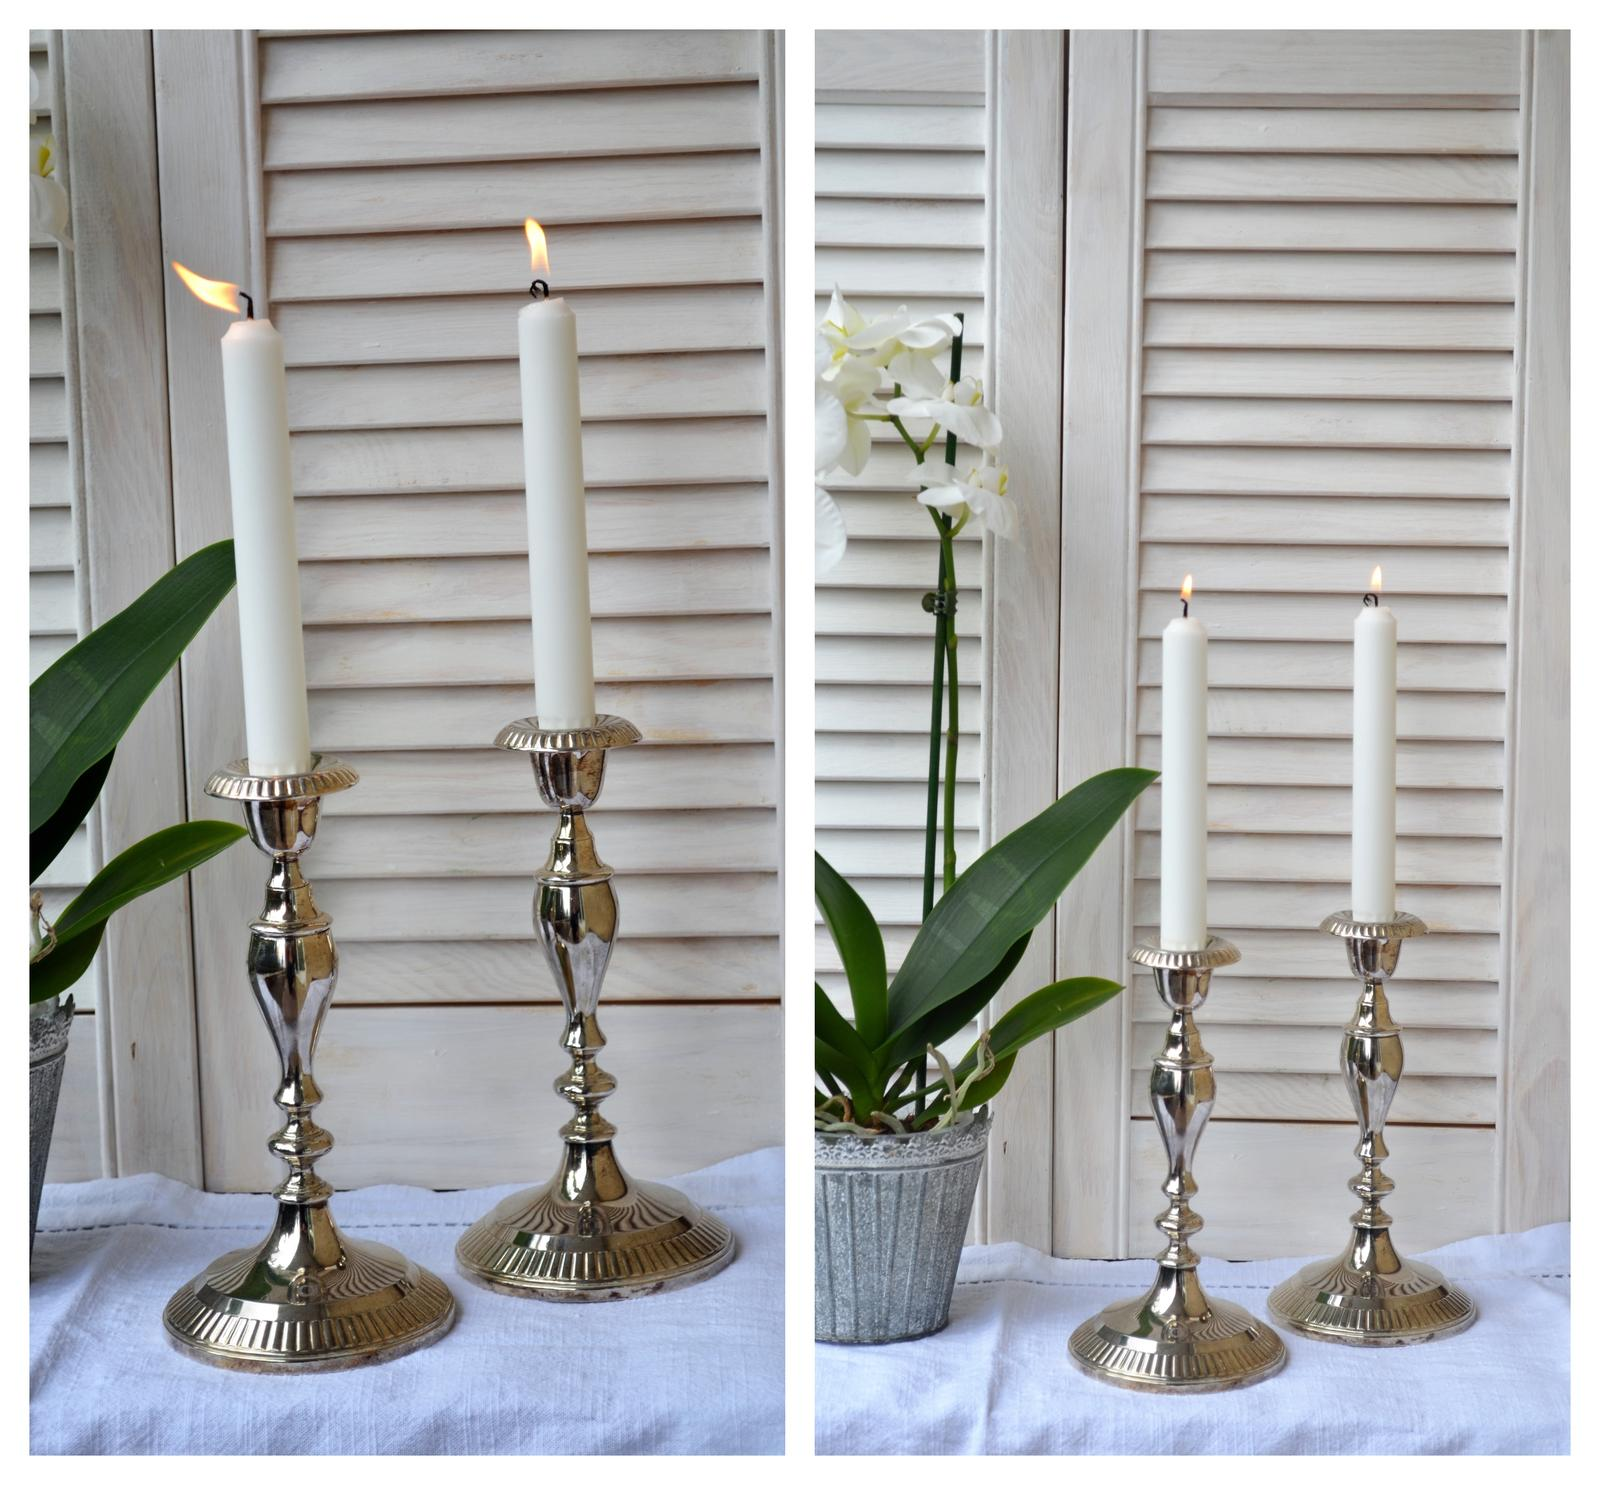 Svietnik na kónickú sviečku - Obrázok č. 3